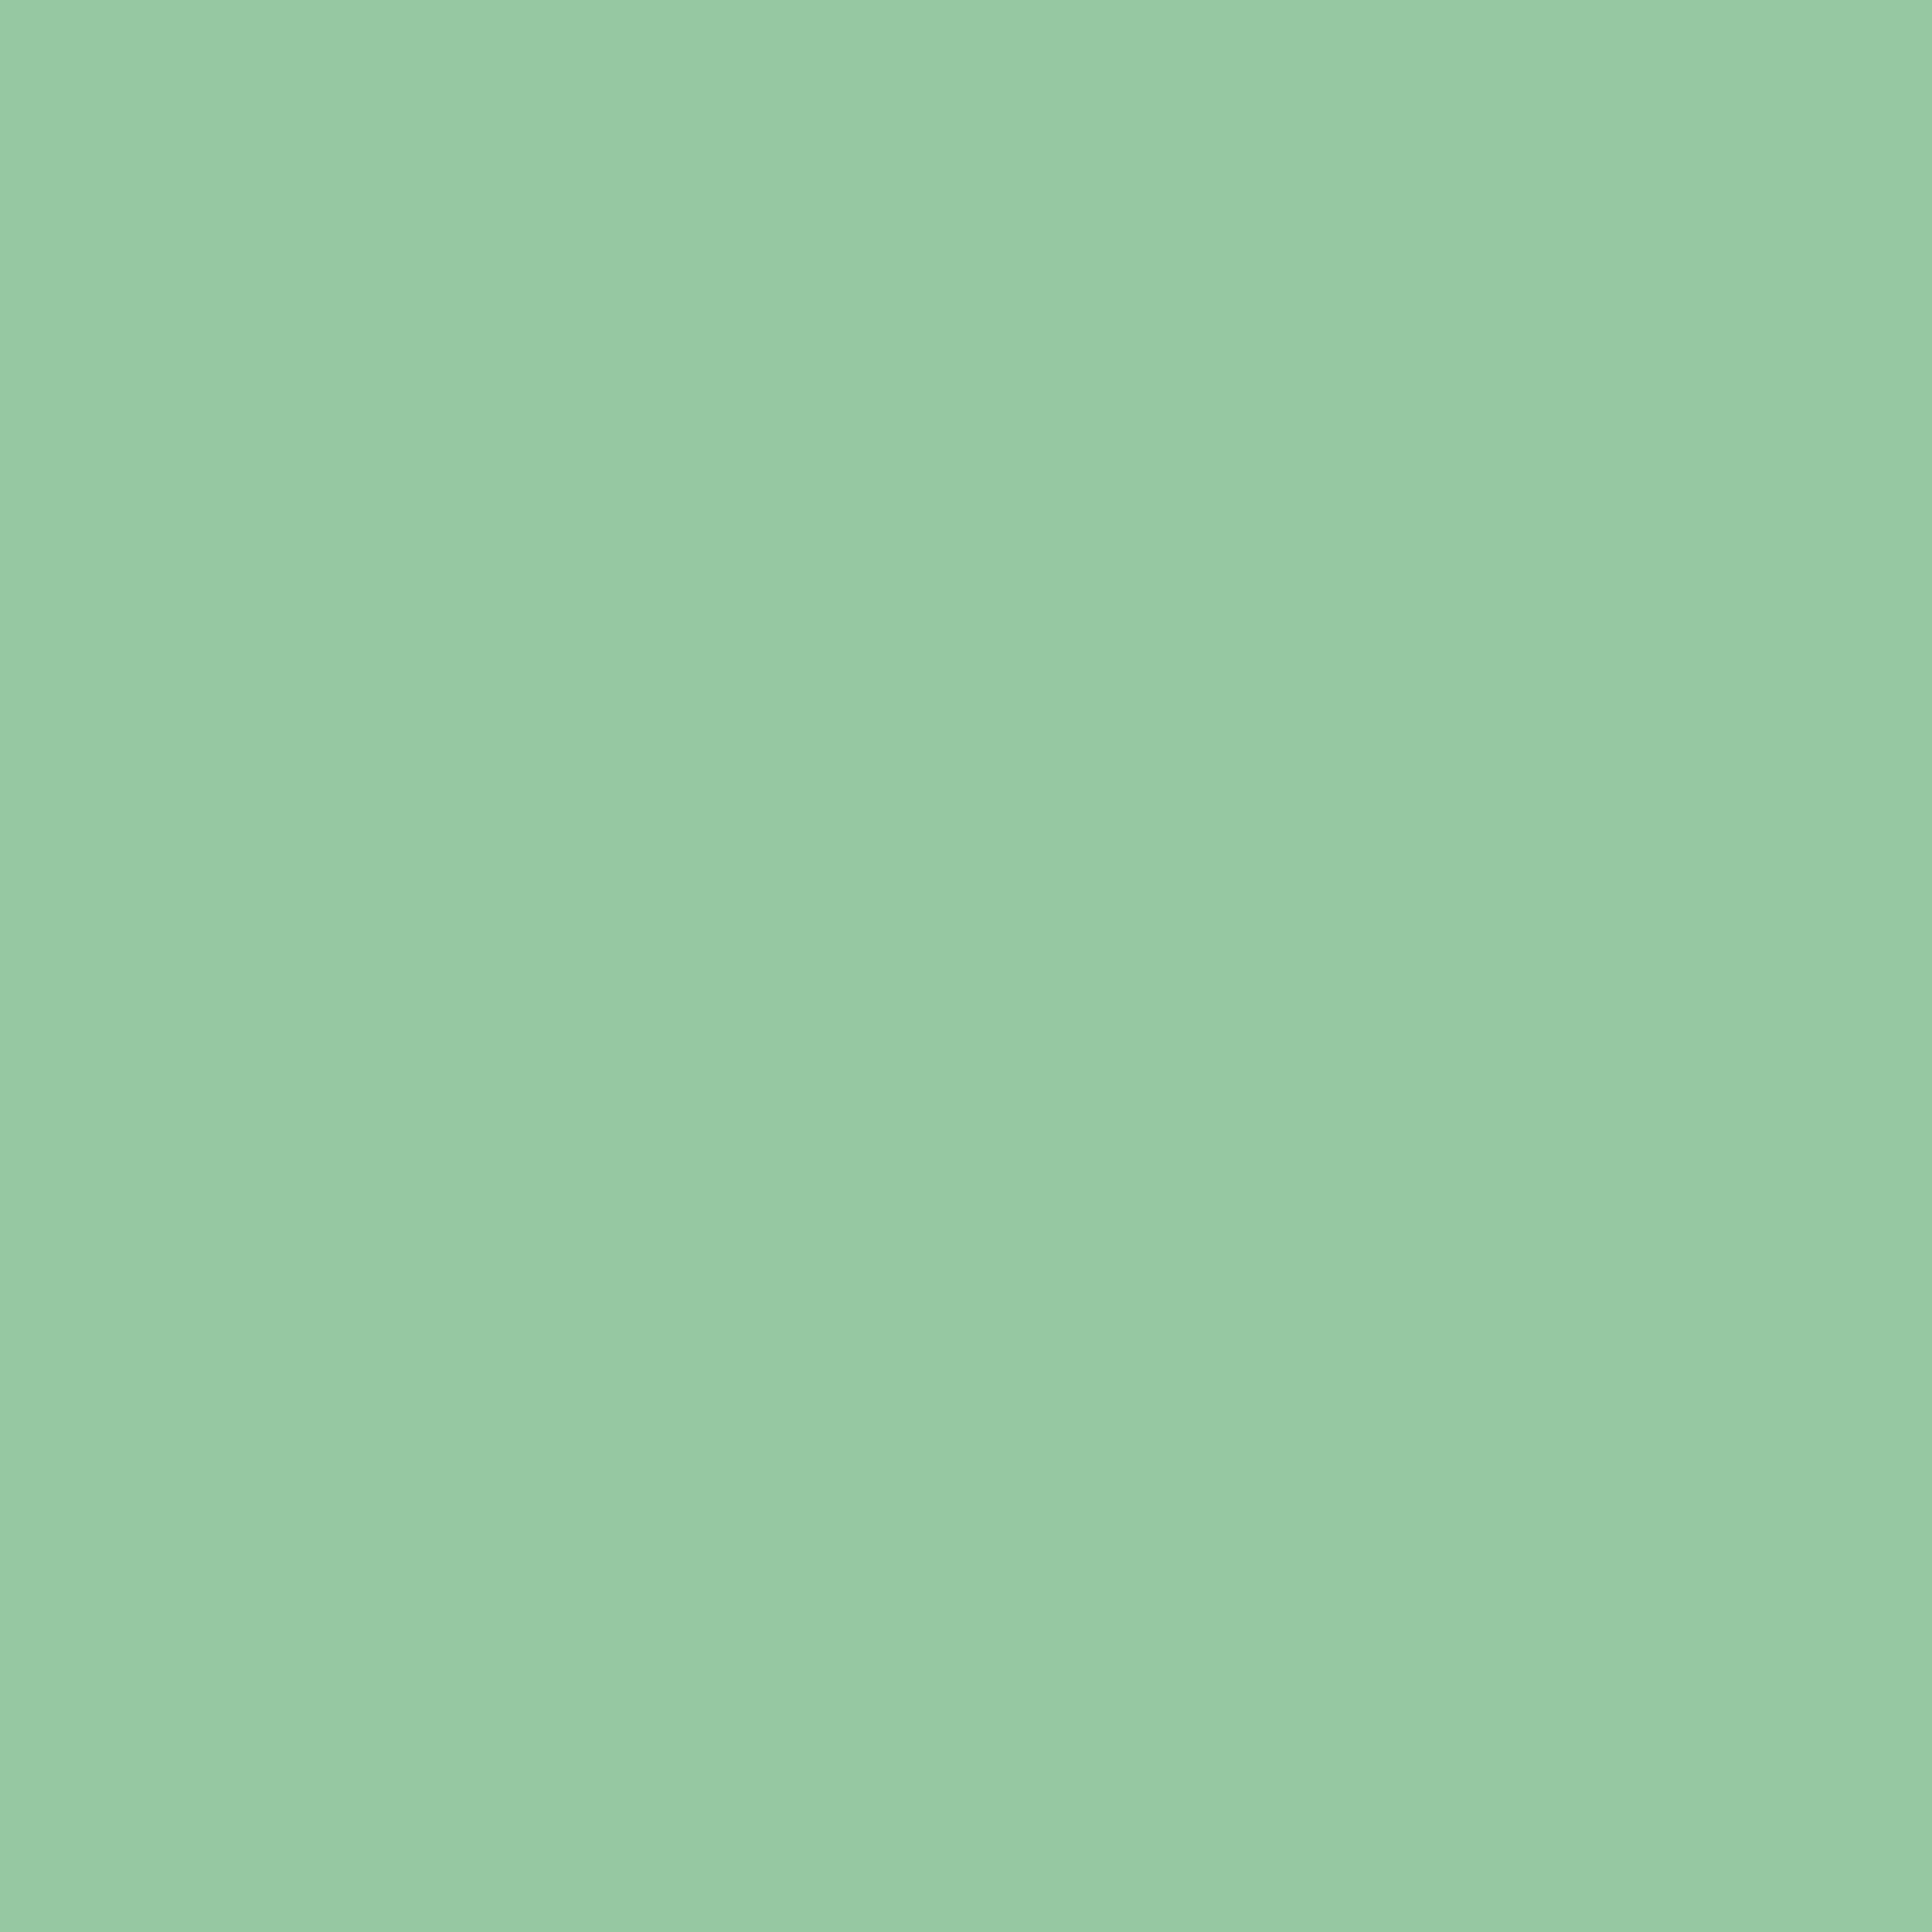 2732x2732 Eton Blue Solid Color Background